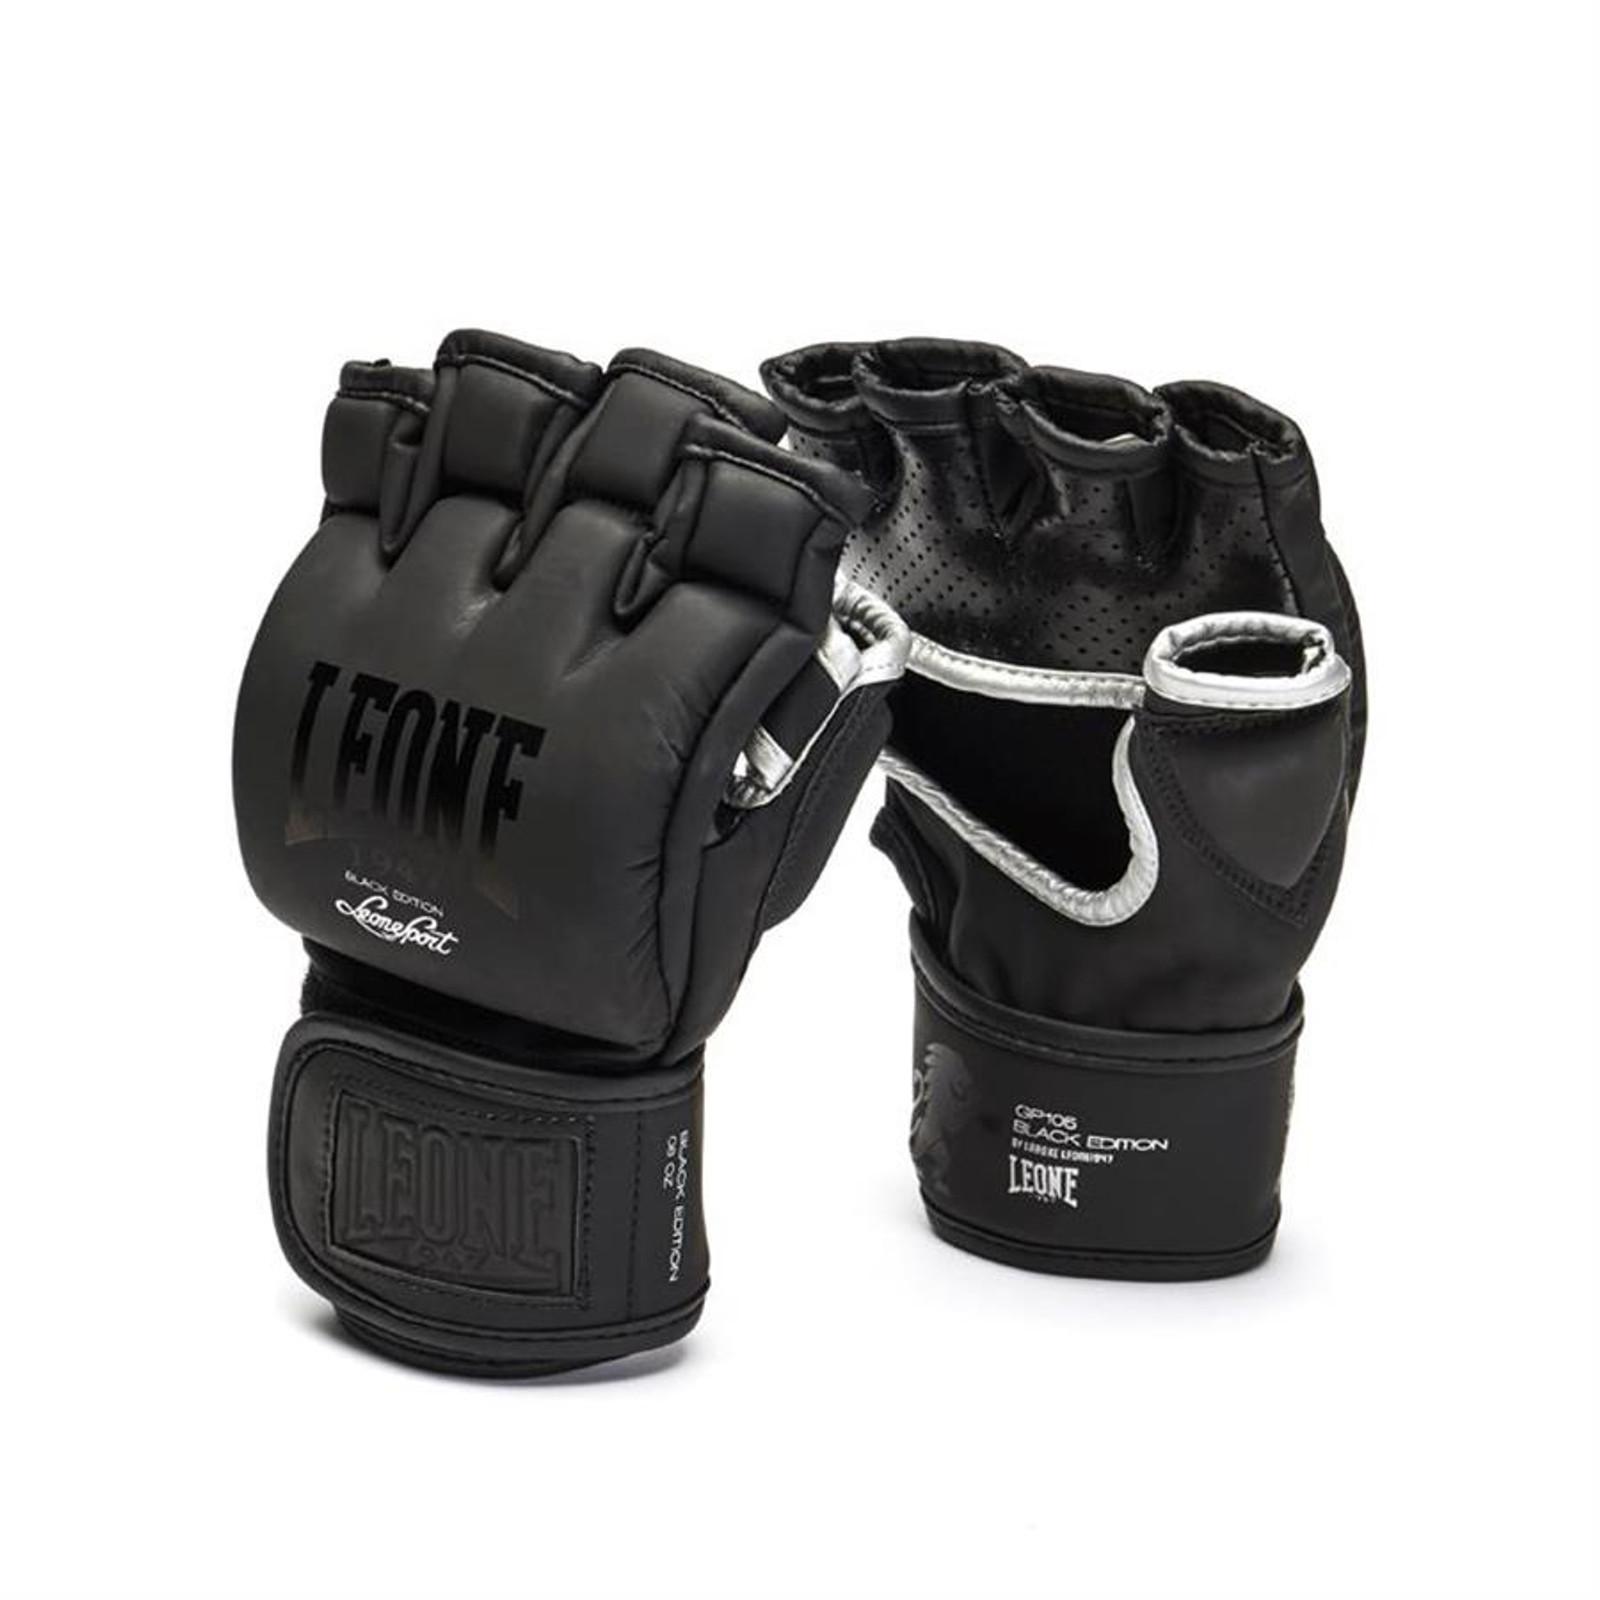 Leone 1947 MMA Handschuhe